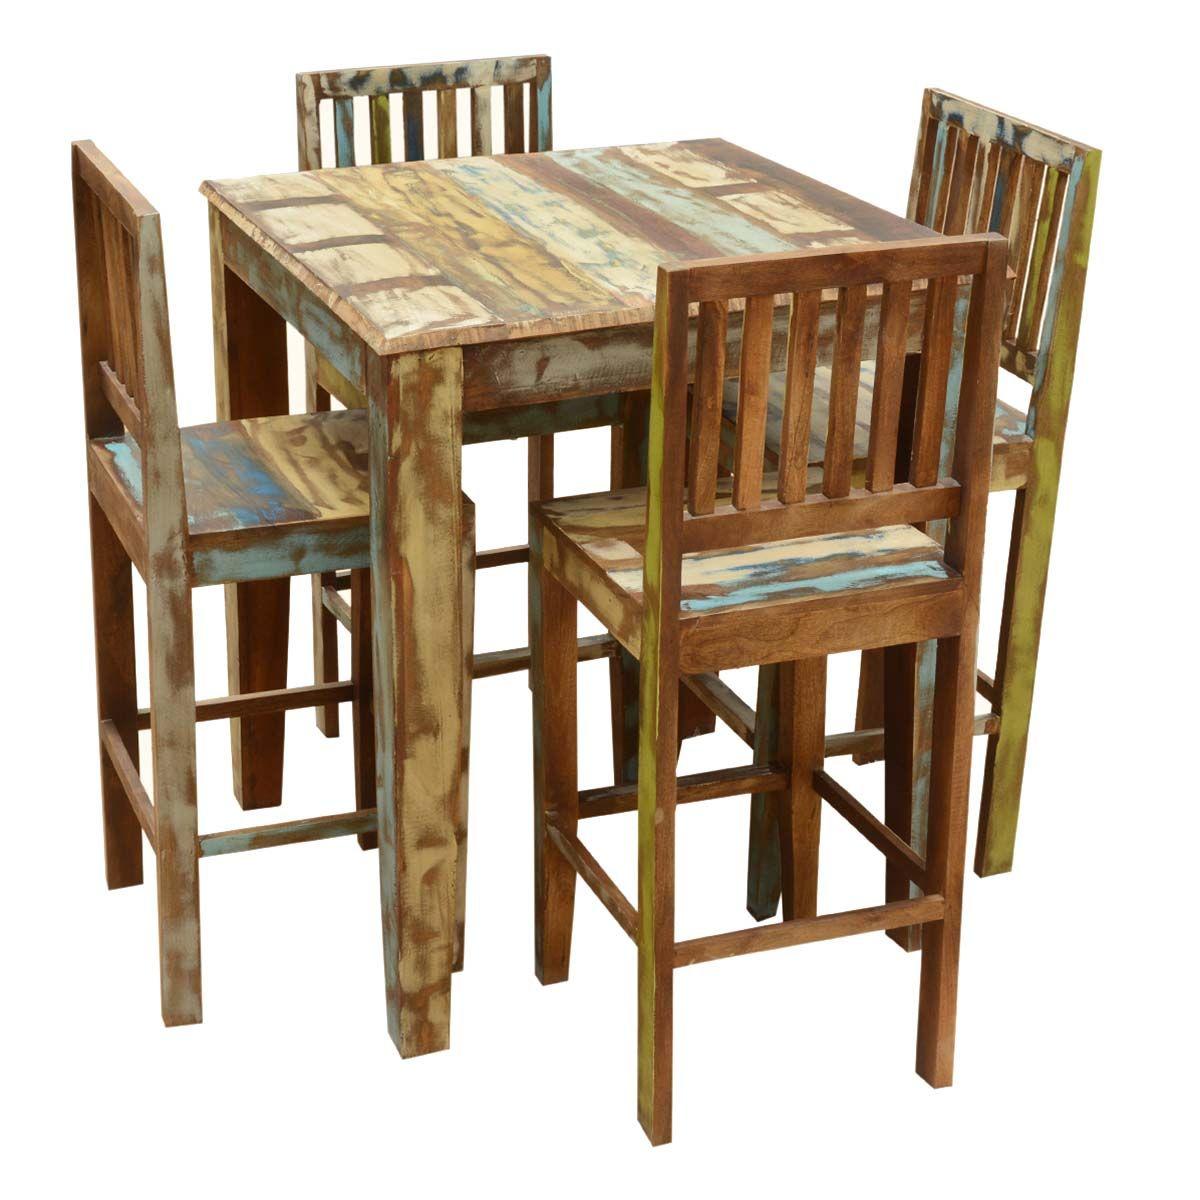 Appalachian Bar Table Pallet Furniture Rustic Reclaimed Wood